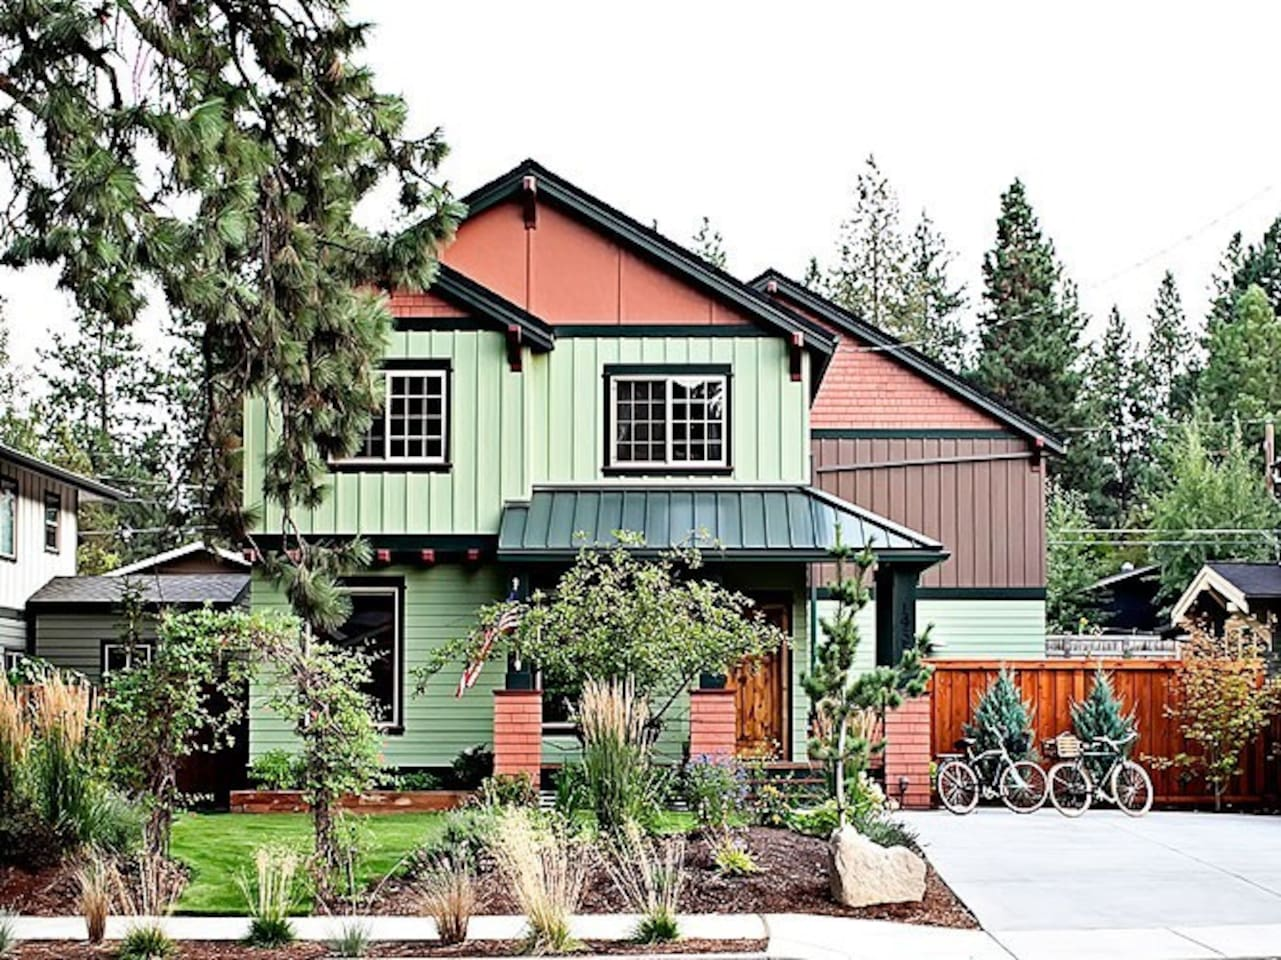 Brand new craftsman home on Newport Avenue